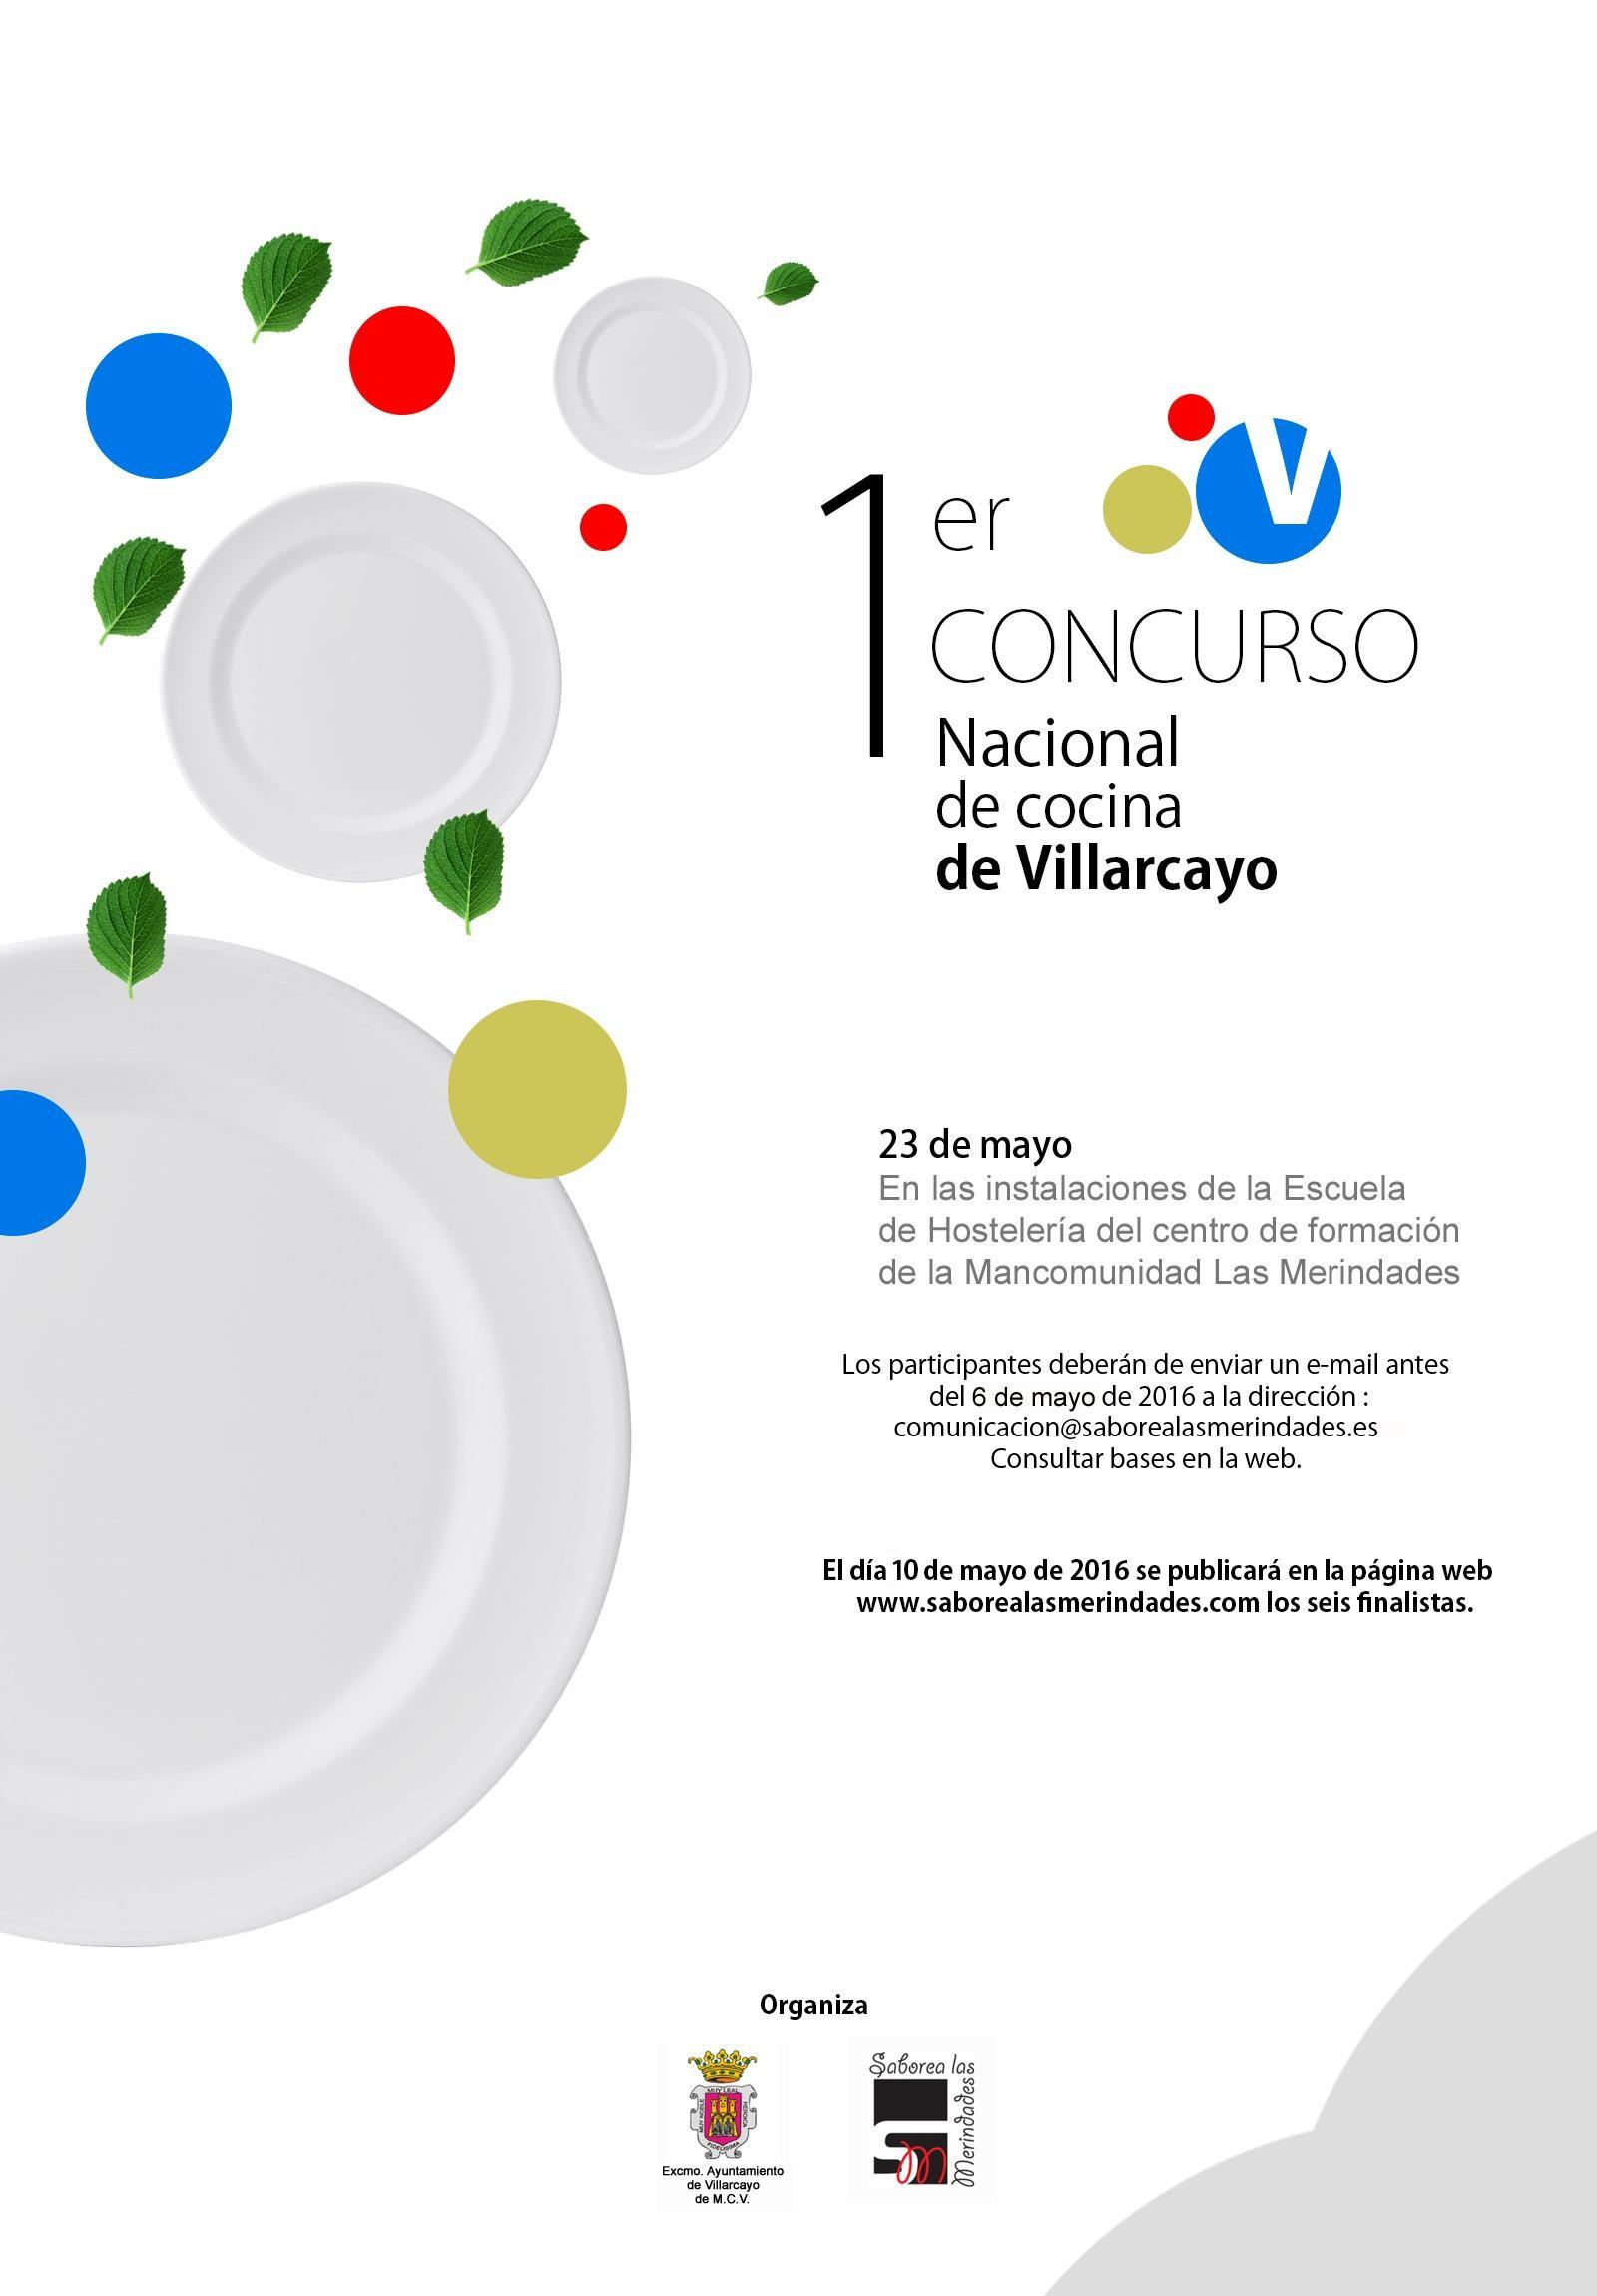 Concurso Nacional de Cocina de Villarcayo